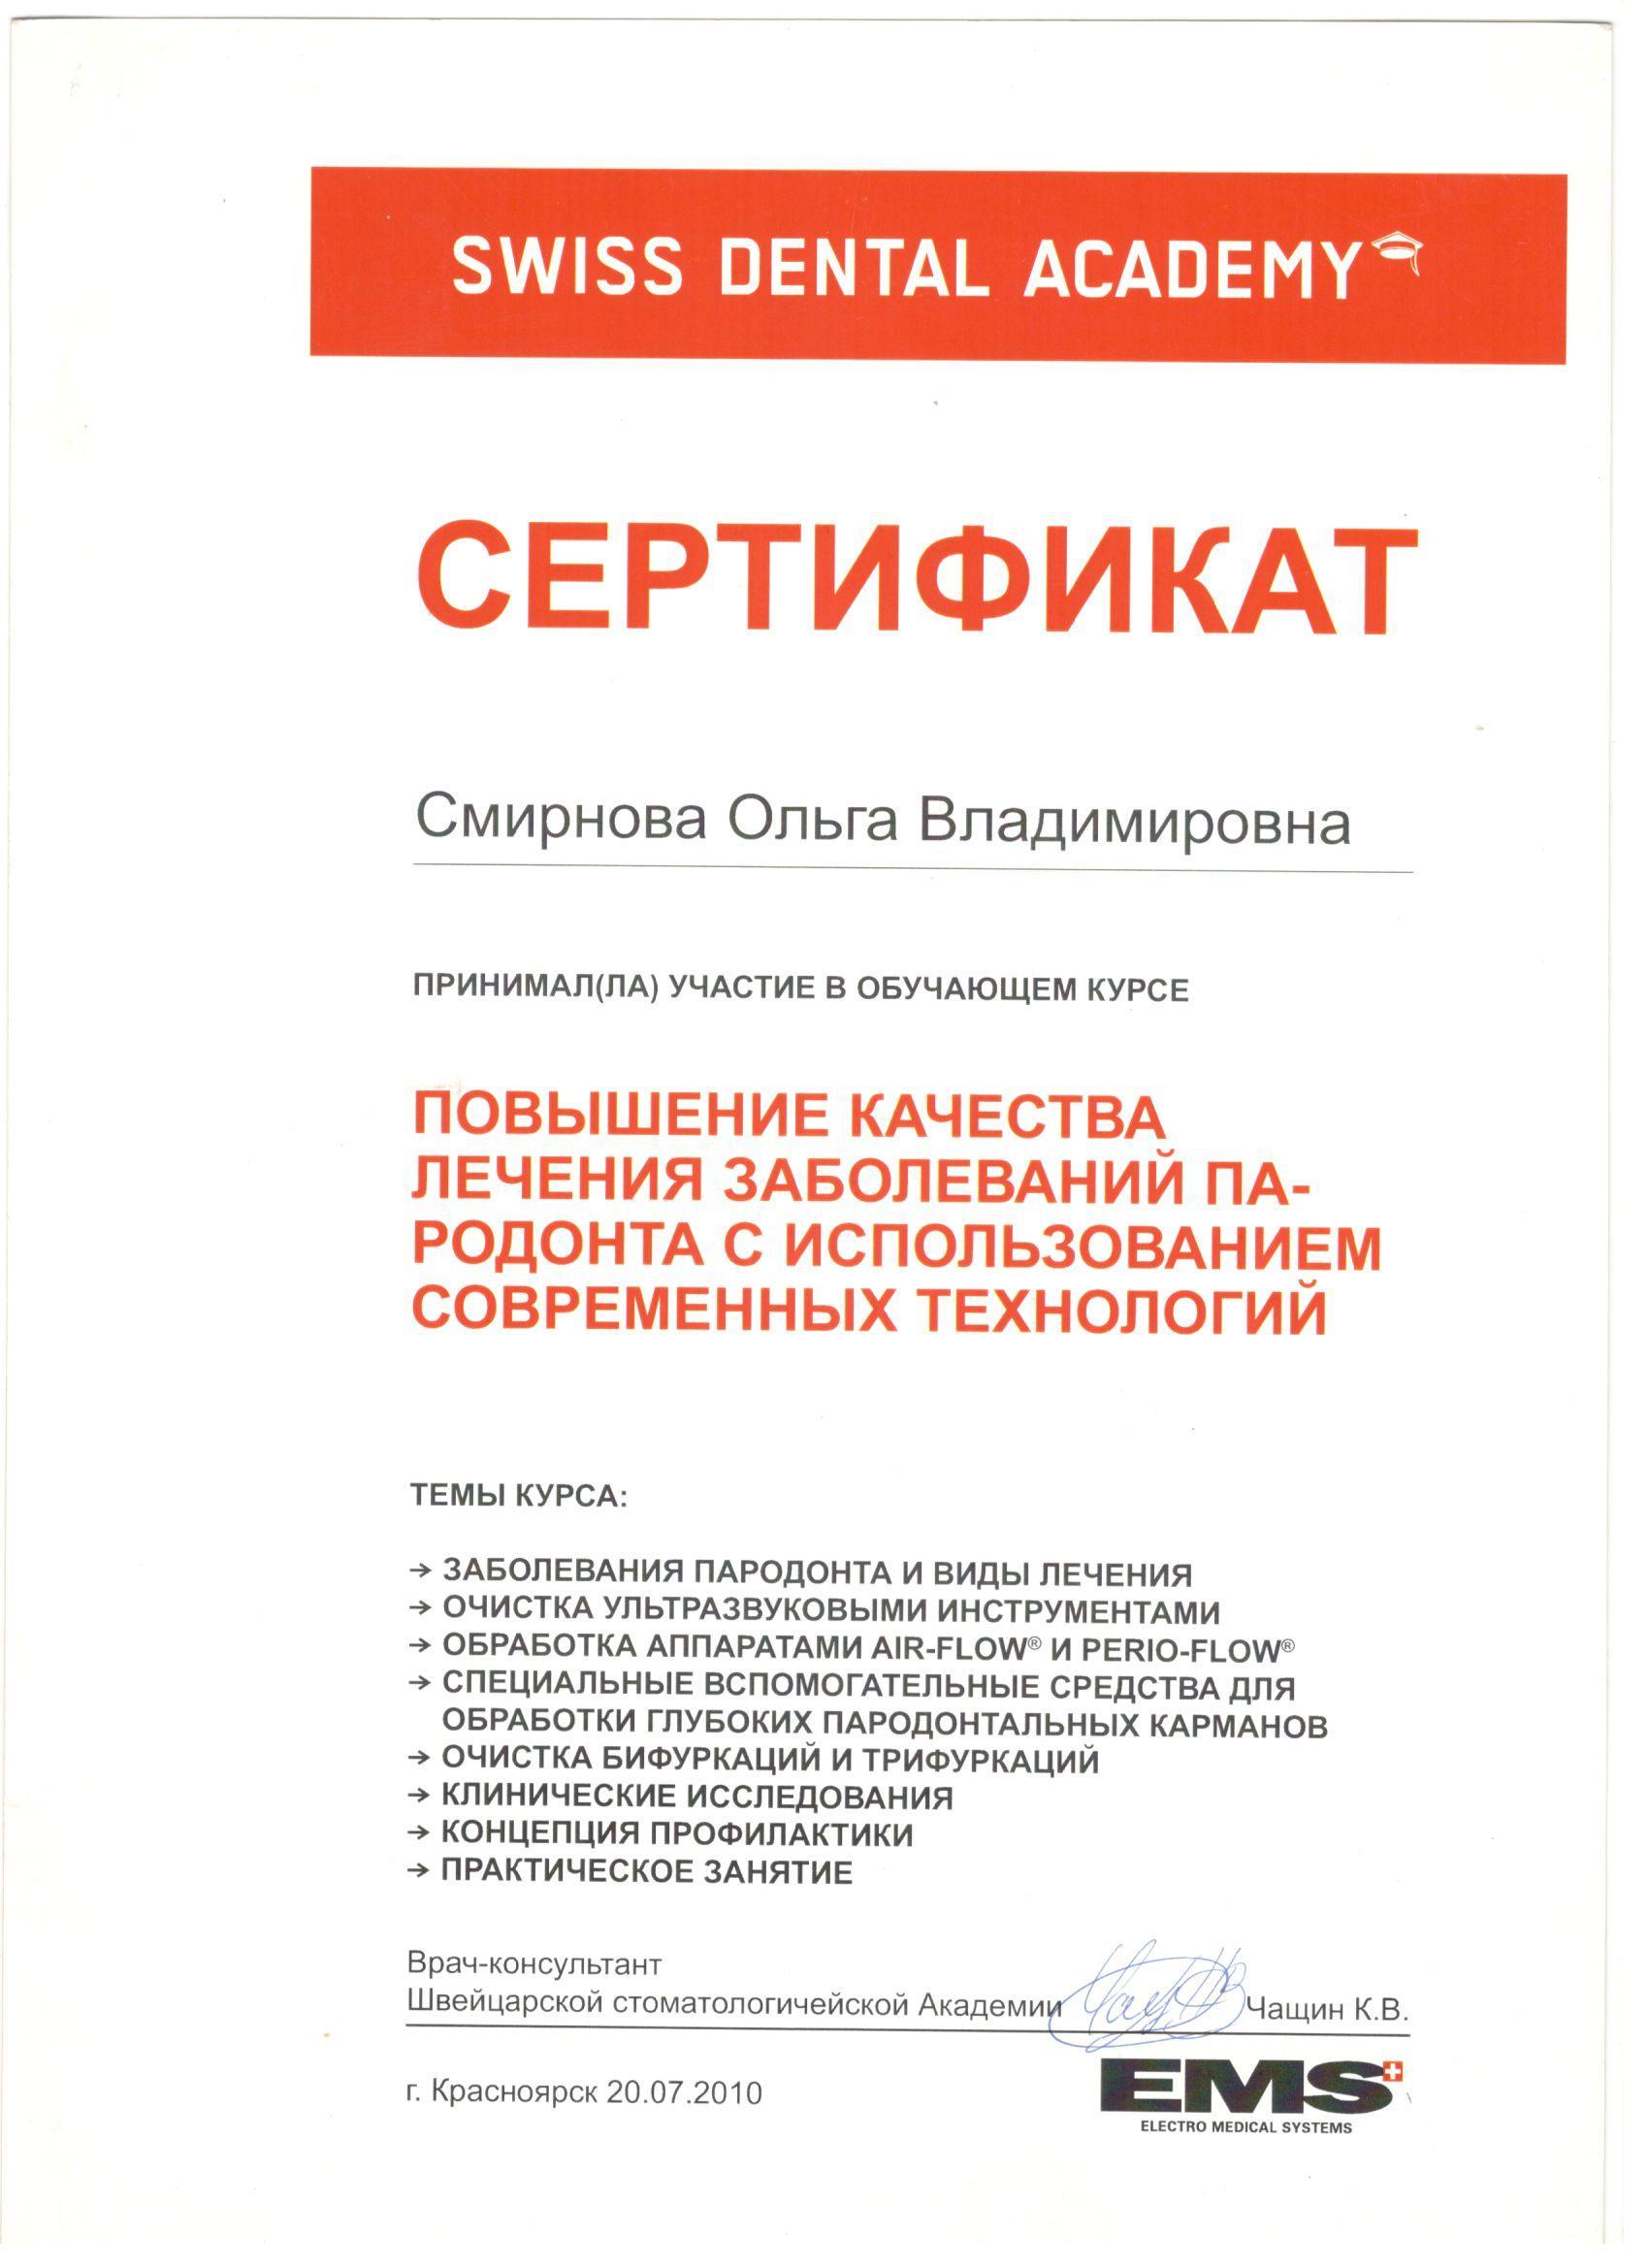 Сертификат 009